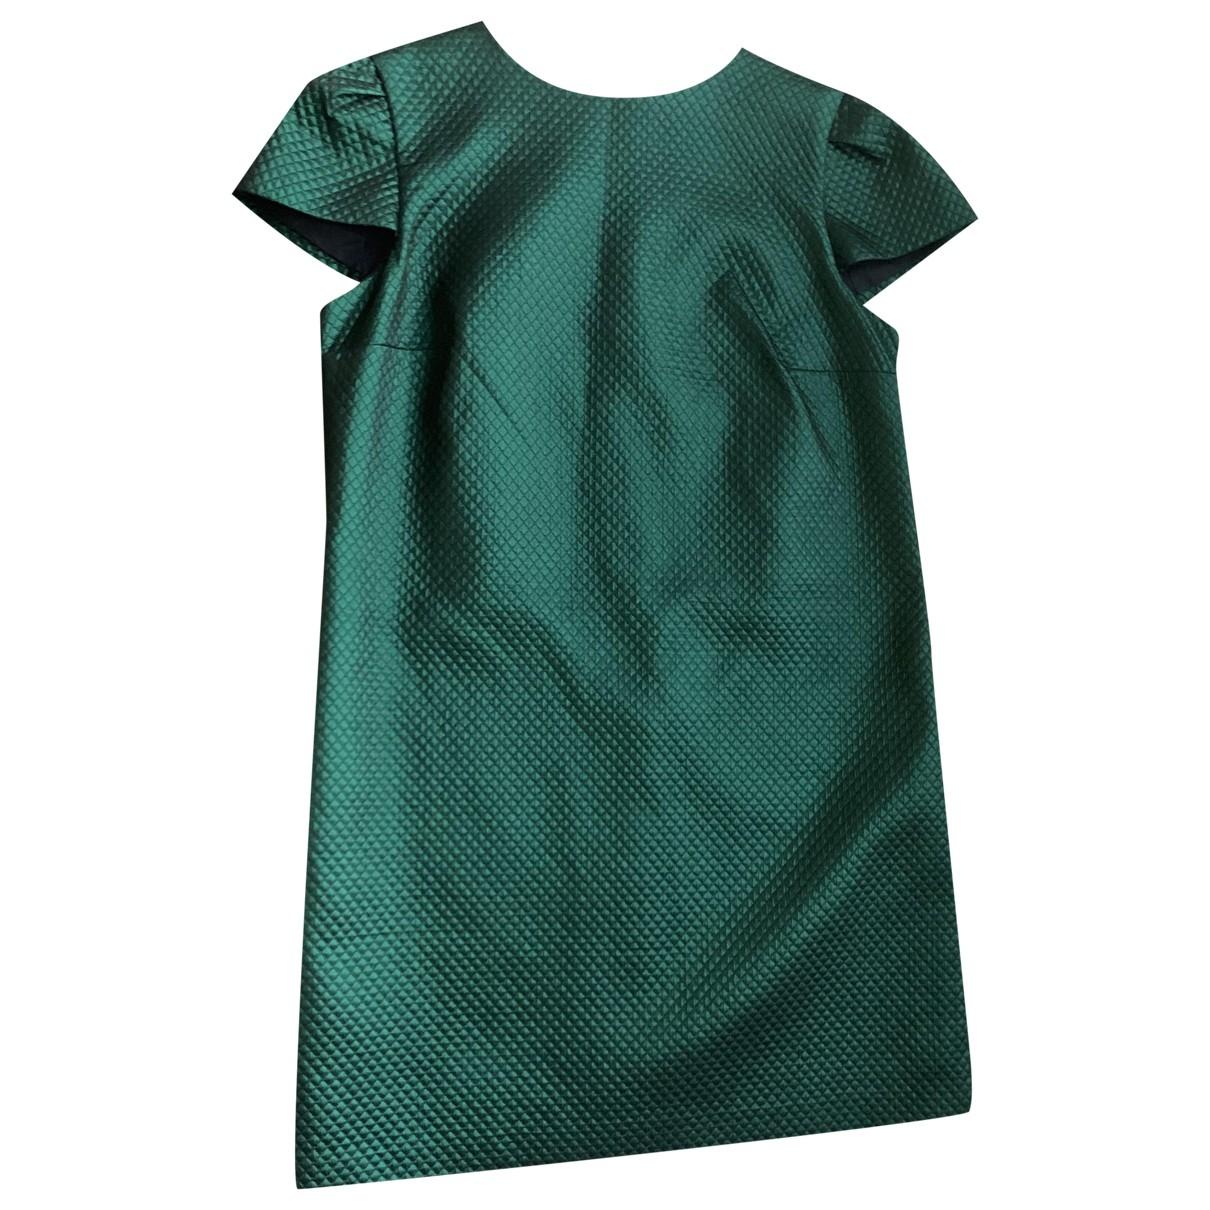 Les Prairies De Paris \N Green dress for Women S International